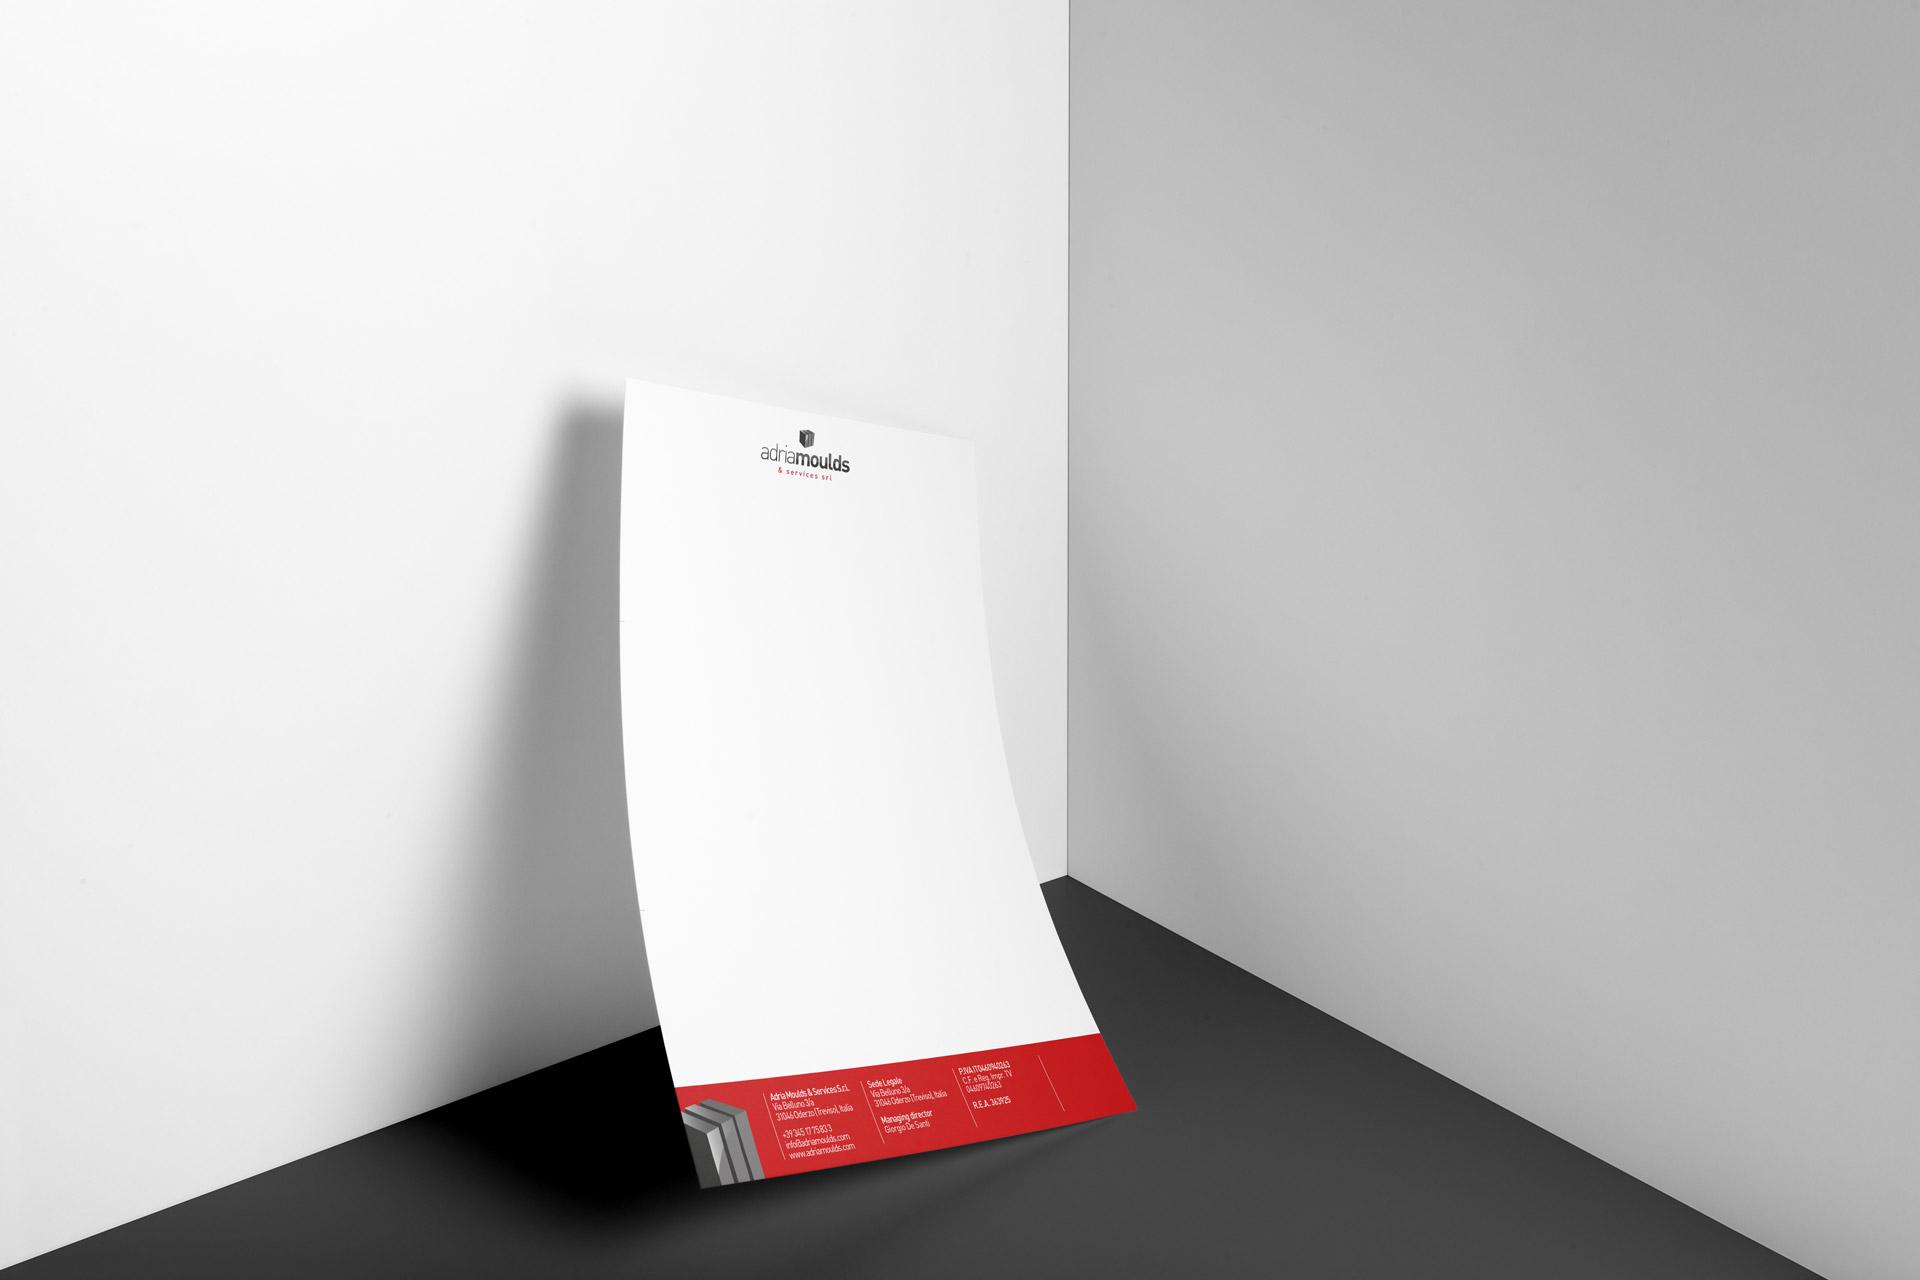 Briefbogendesign